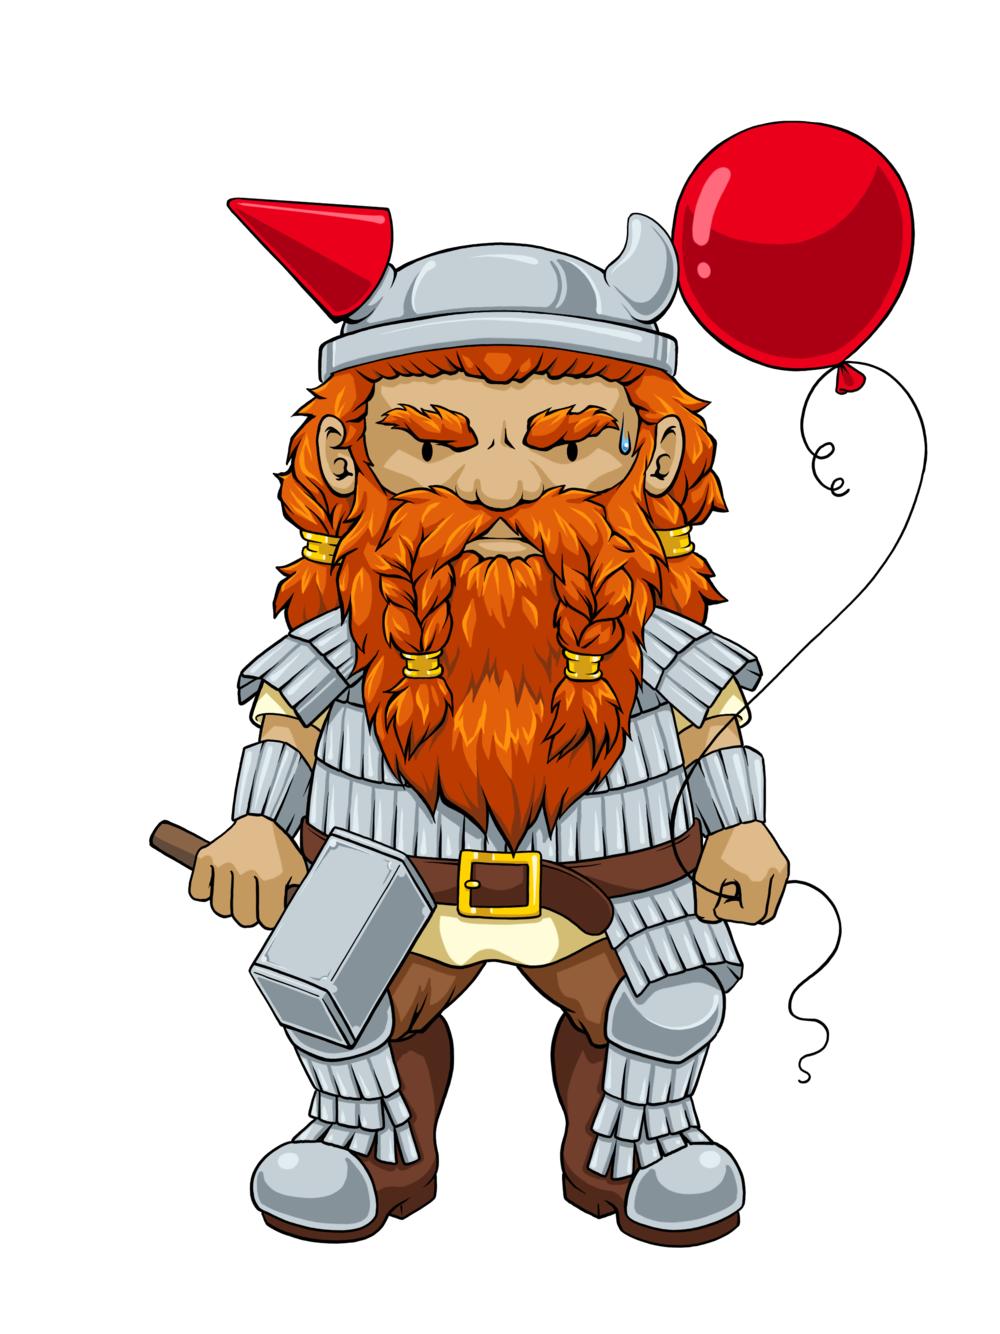 Fulgrim Ironbeard